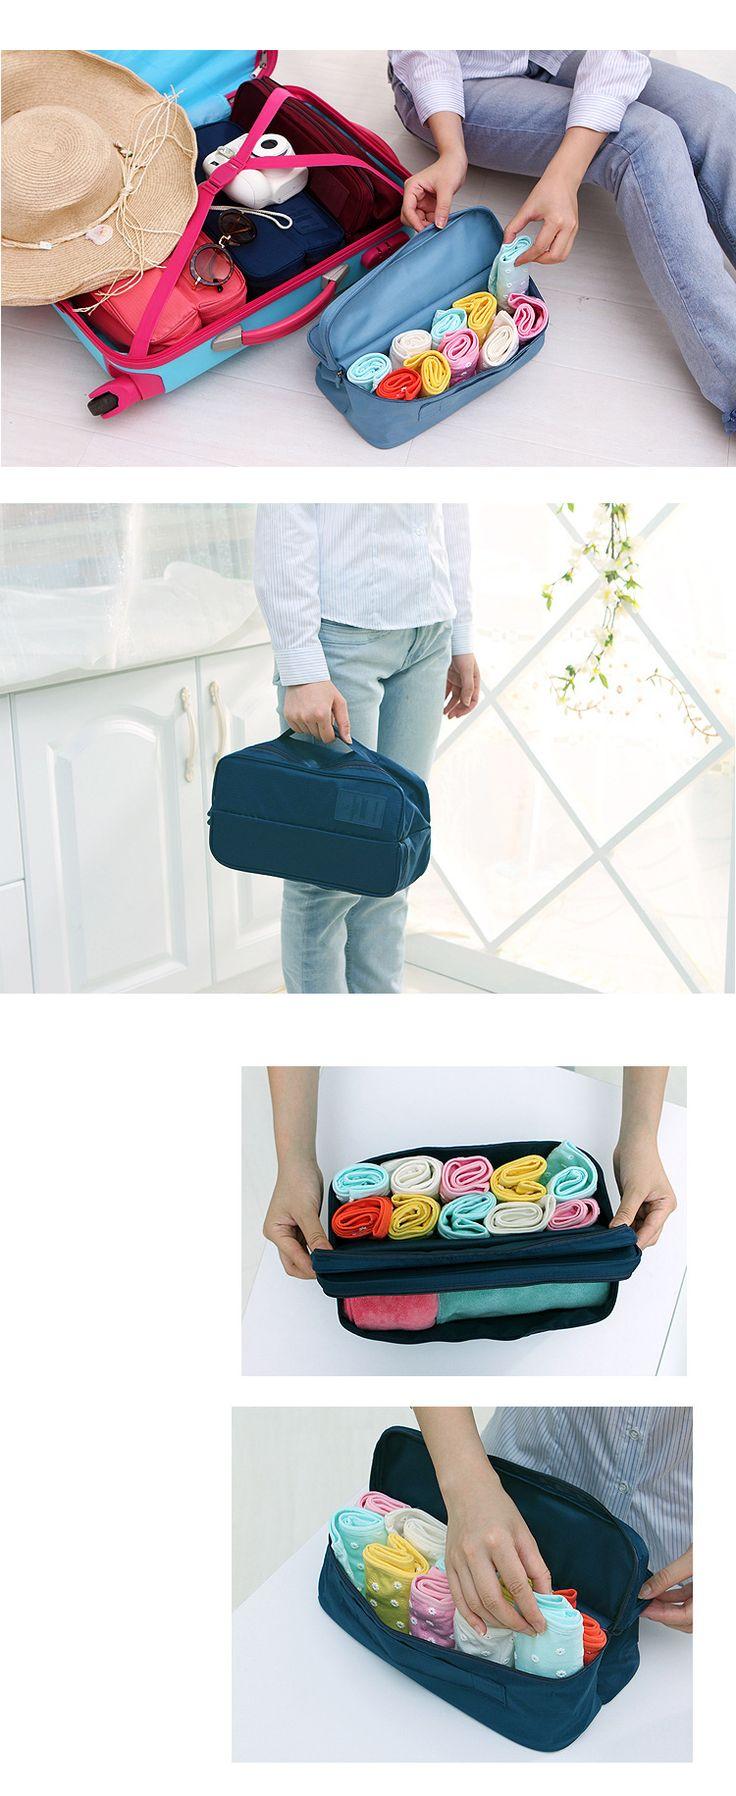 Do you like the bag?